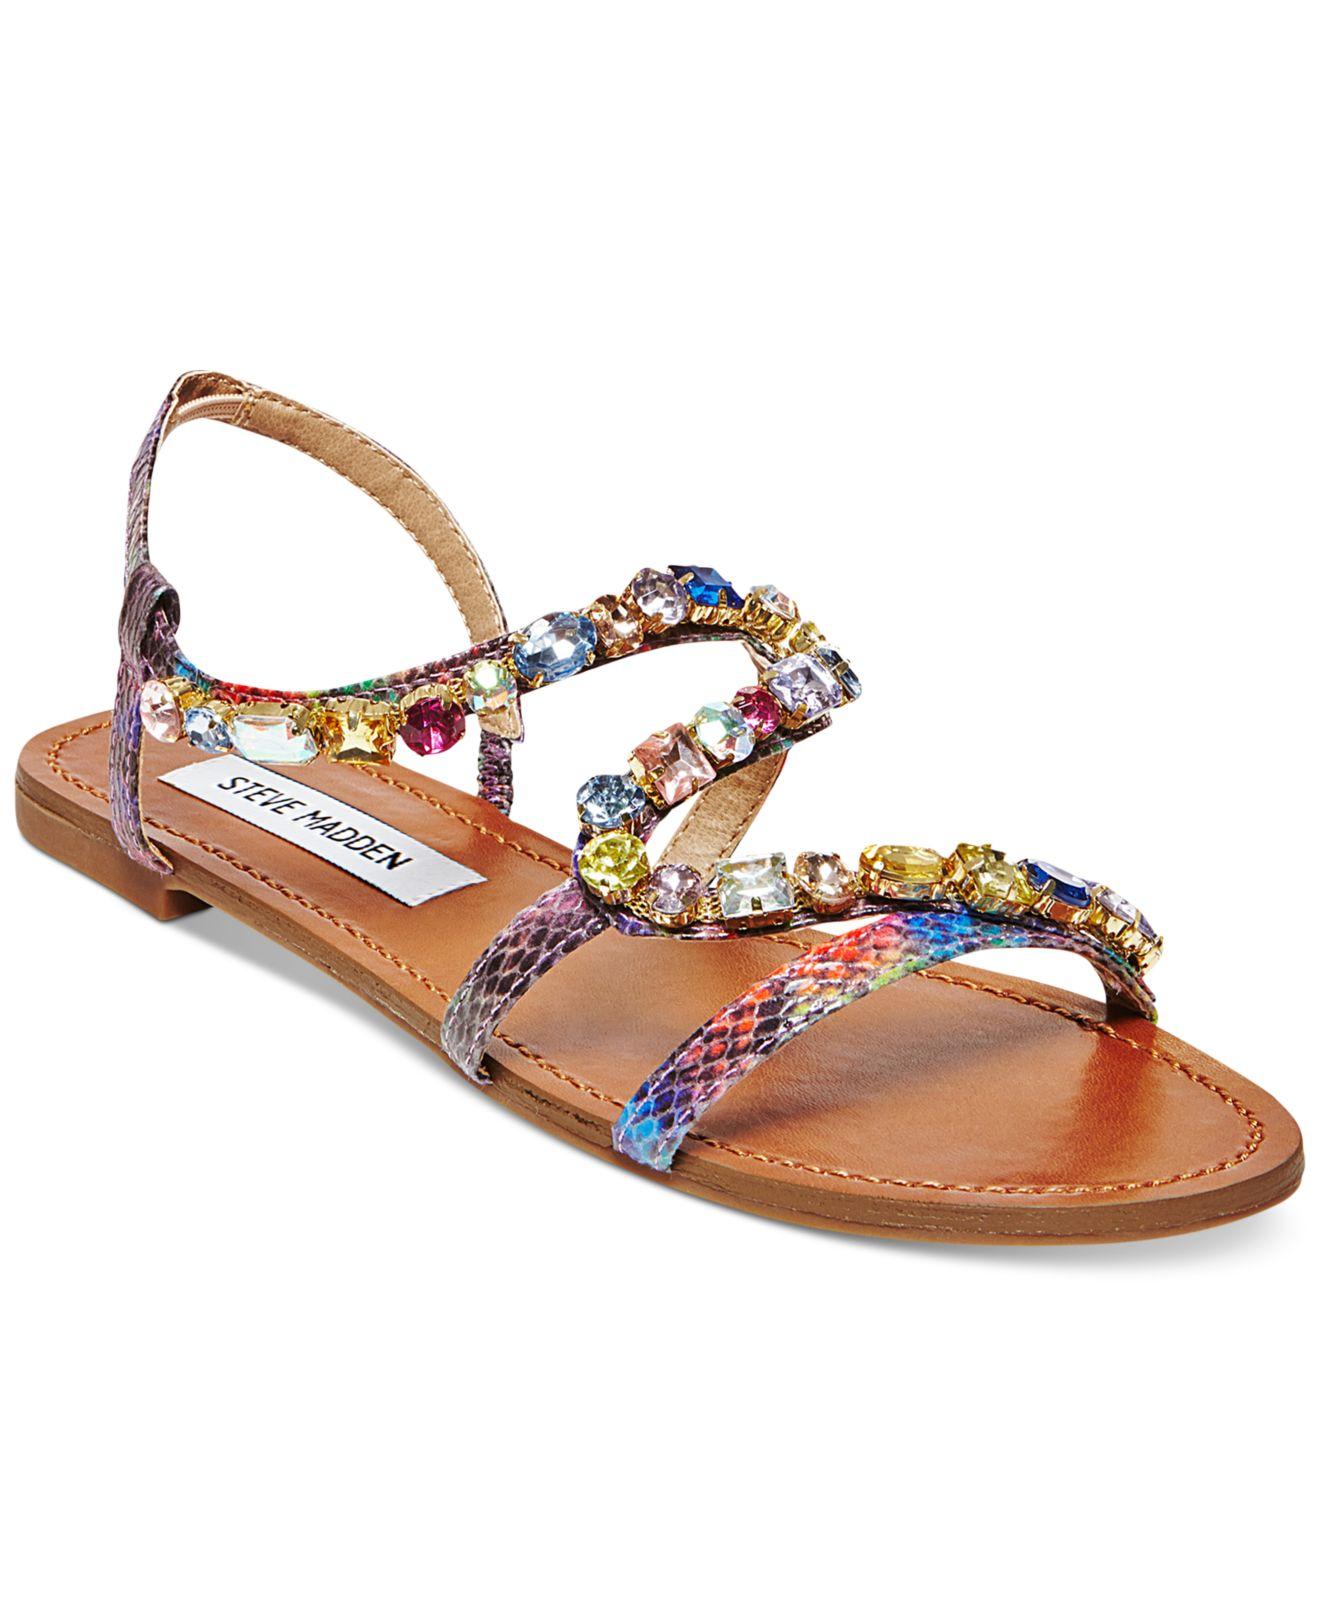 9babff5ed05a04 Lyst - Steve Madden Blazzzed Jeweled Flat Sandals